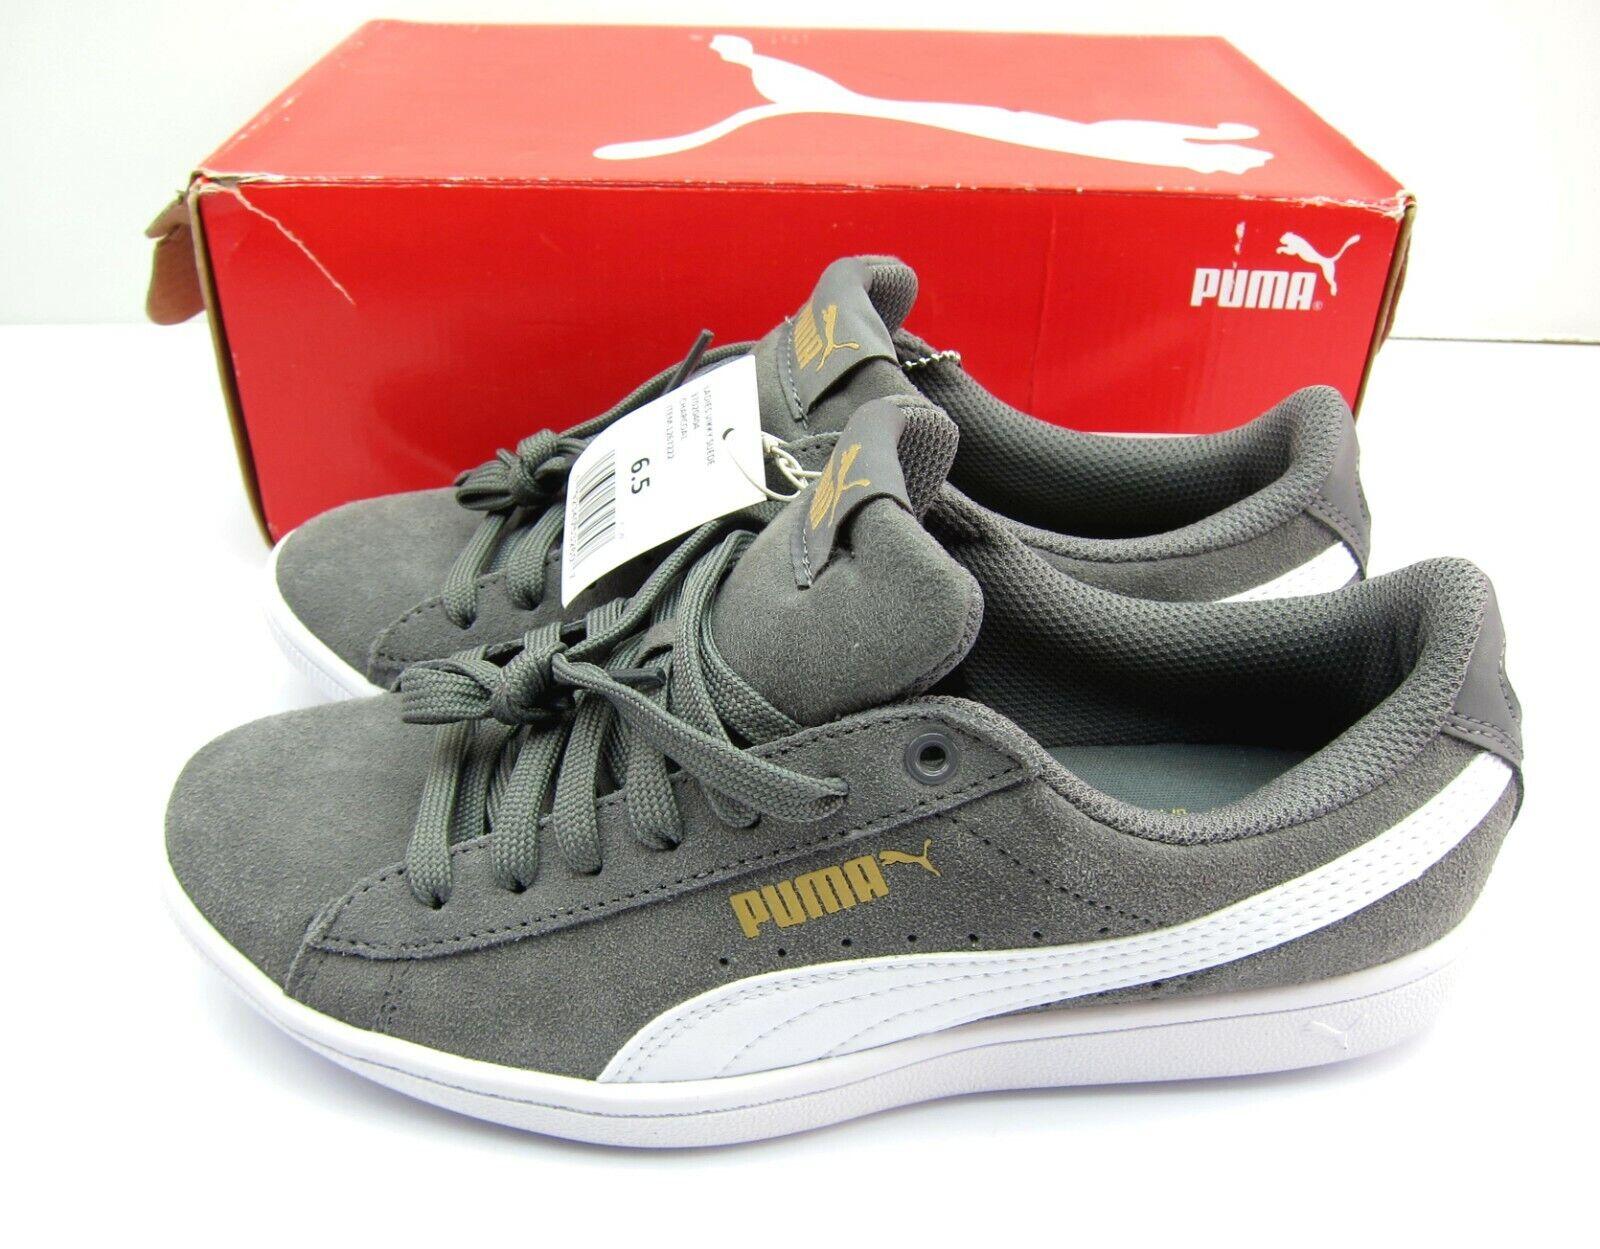 PUMA Ladies Vikky Suede Athletic Sneakers Shoes, Grey, 6.5 -